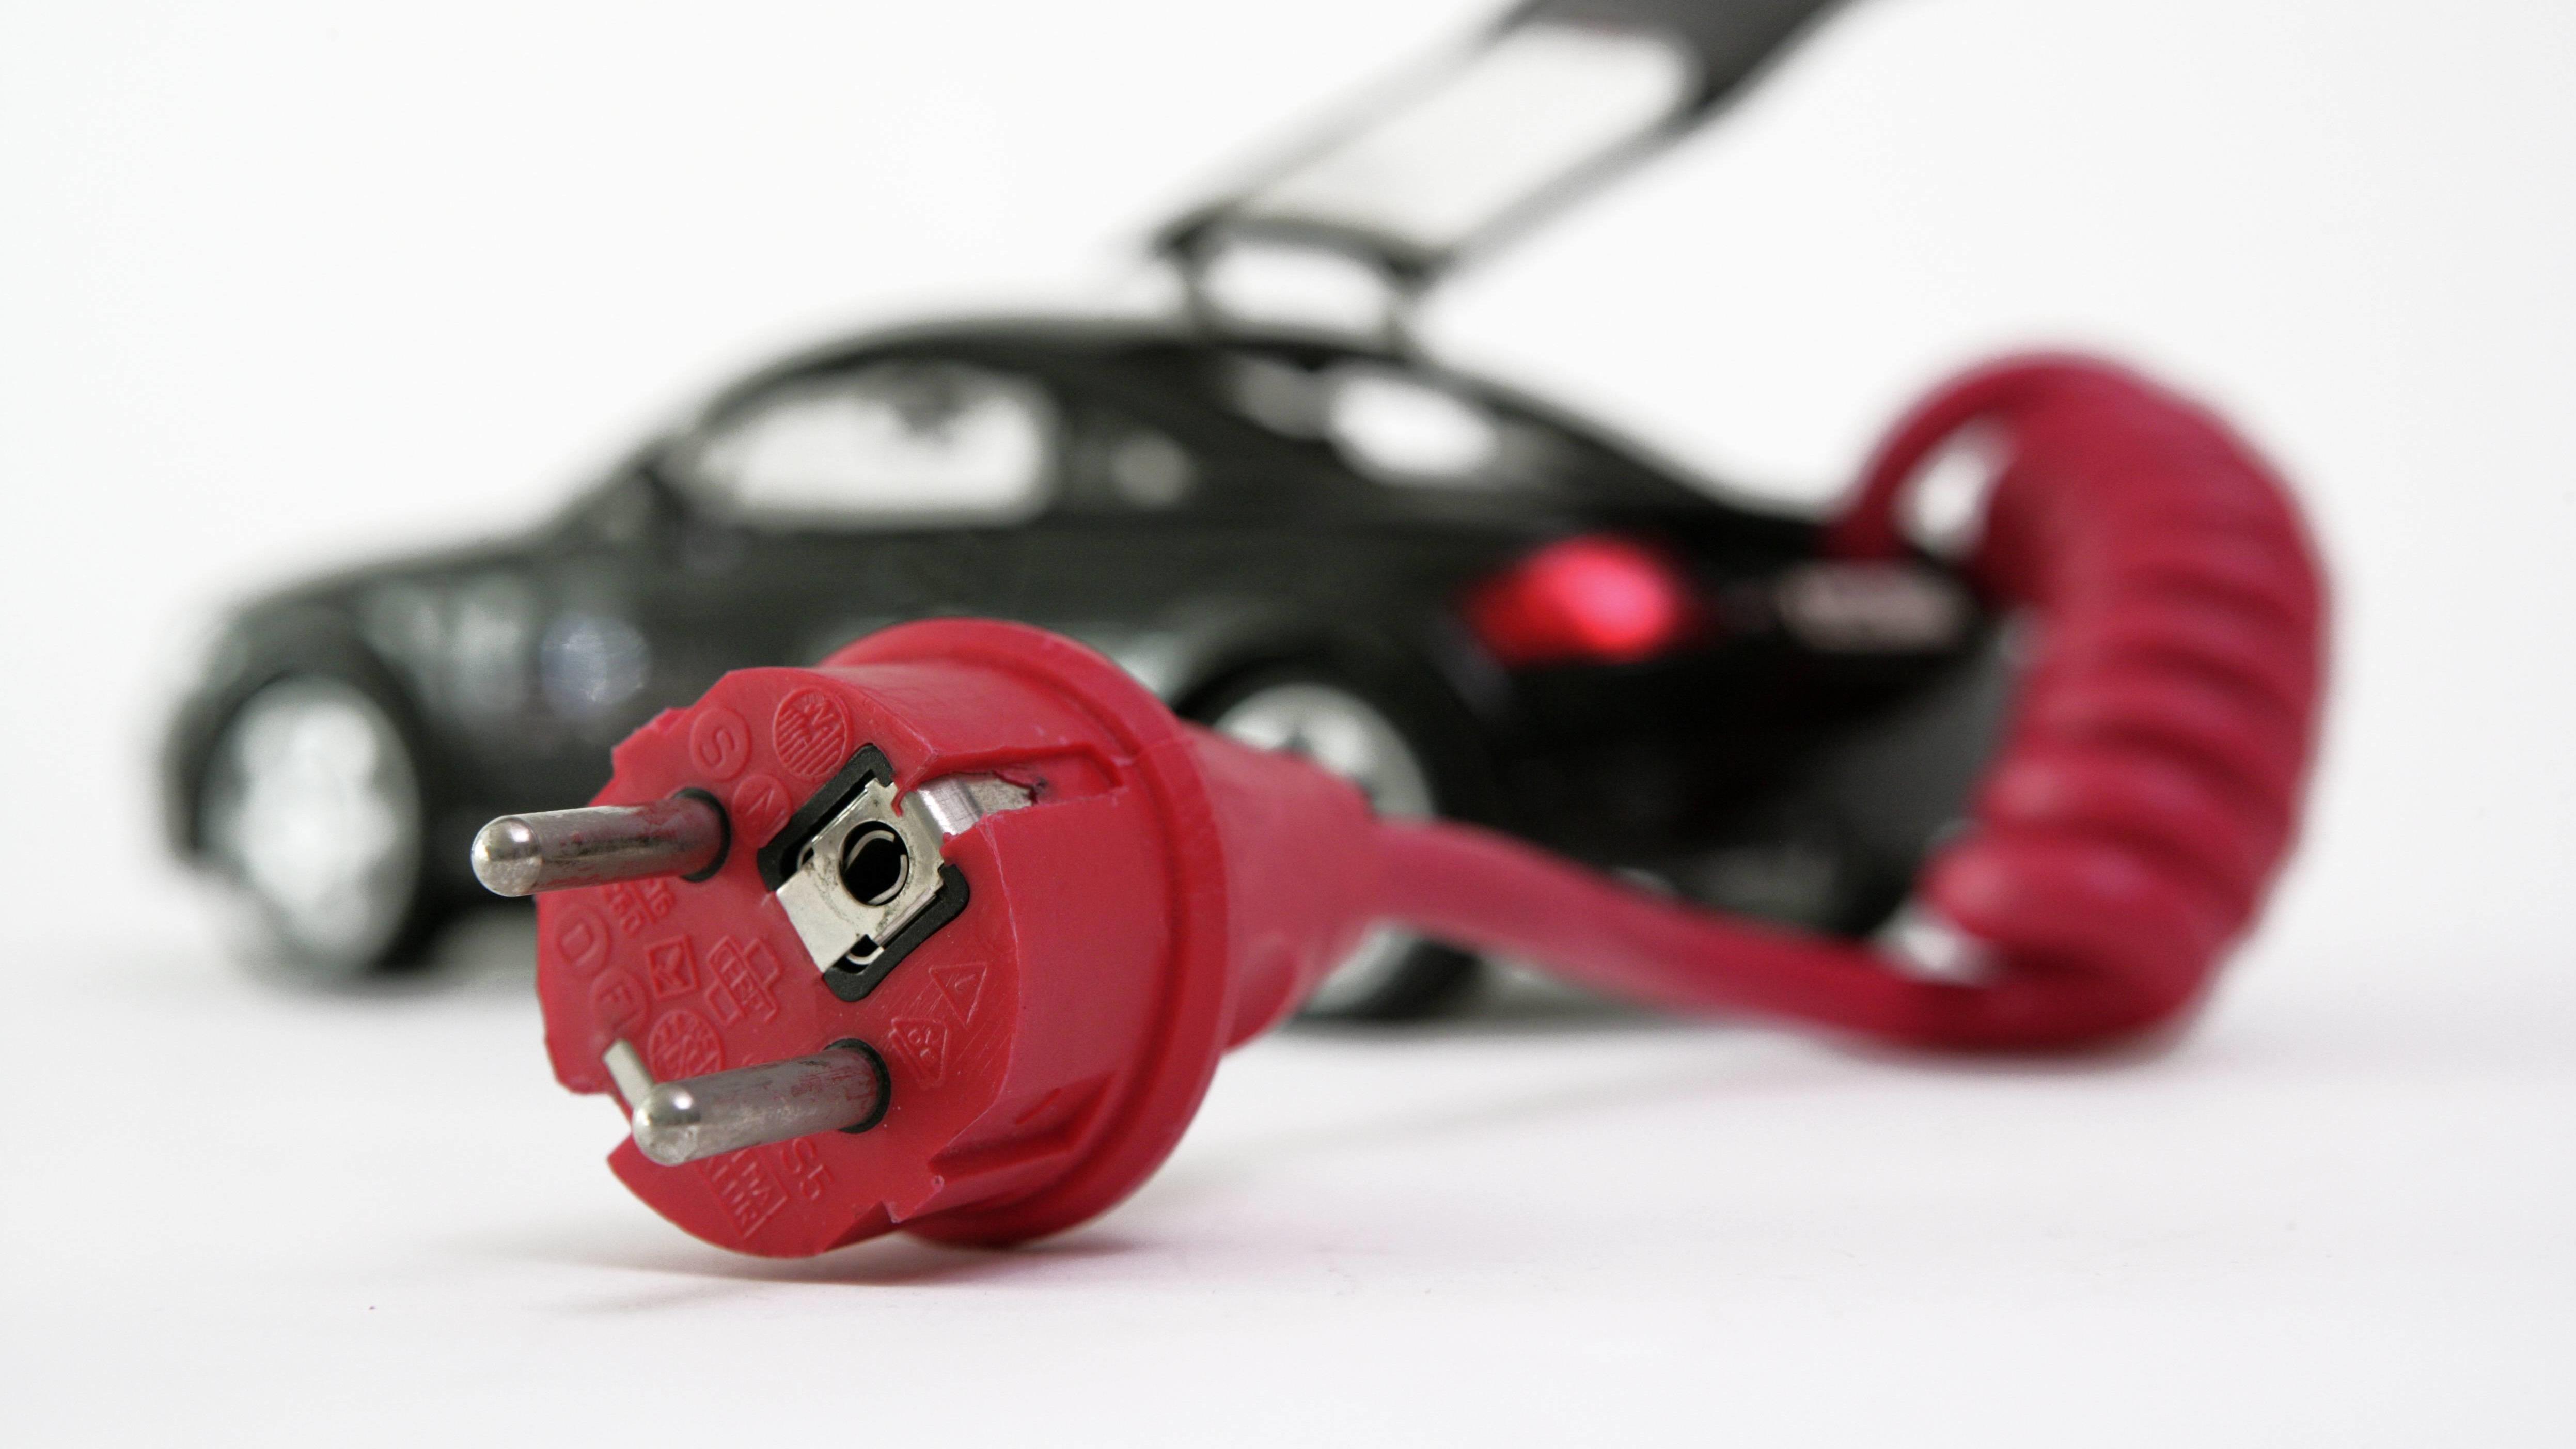 Symbolfoto zum Thema Elektroauto